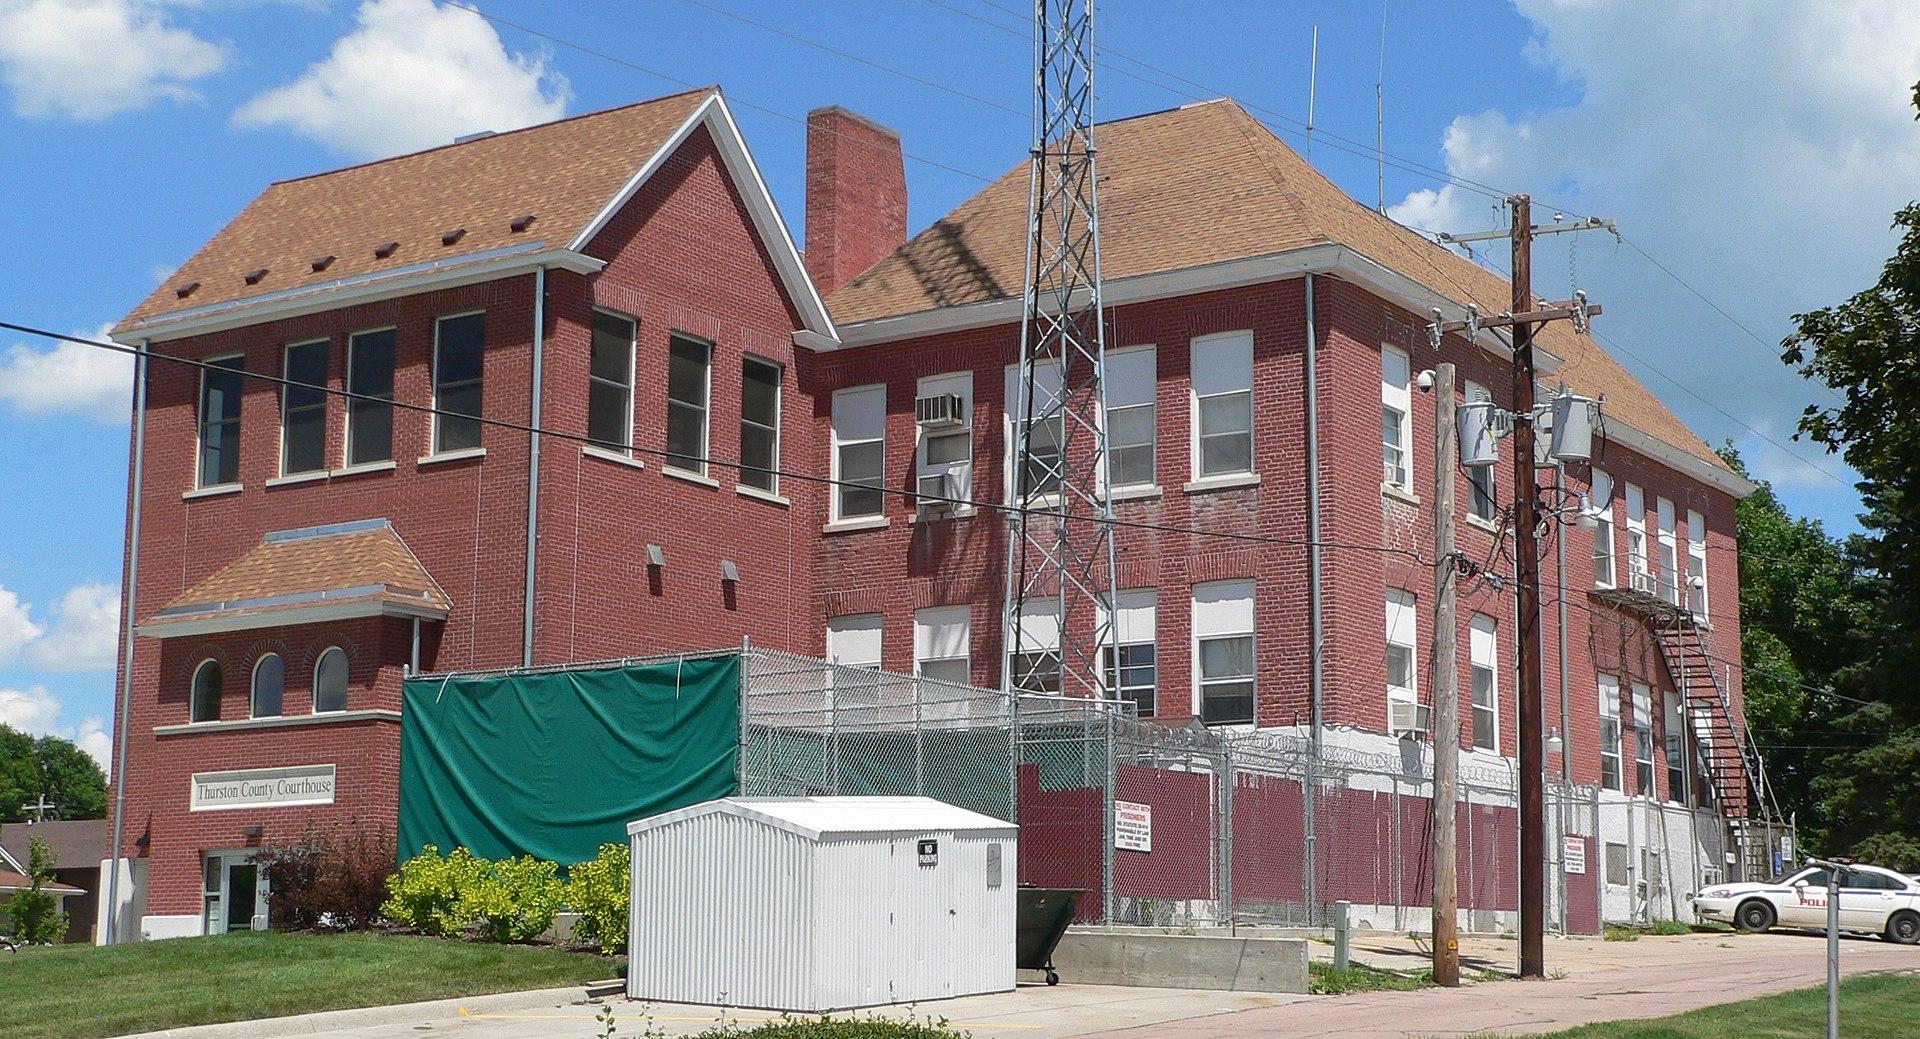 Pender County Building Permit Application